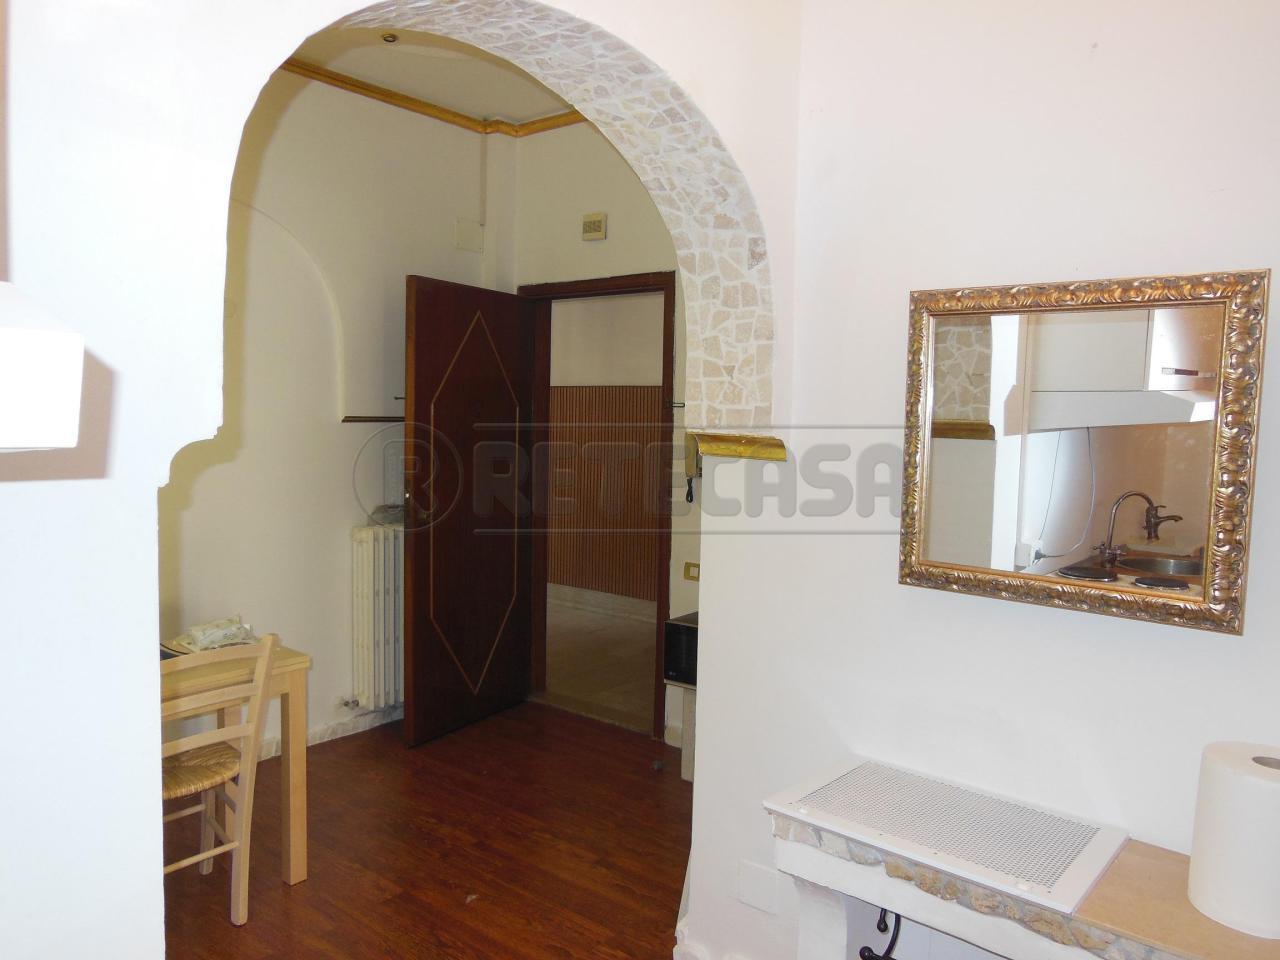 Bilocale Ancona Via Antinori 1